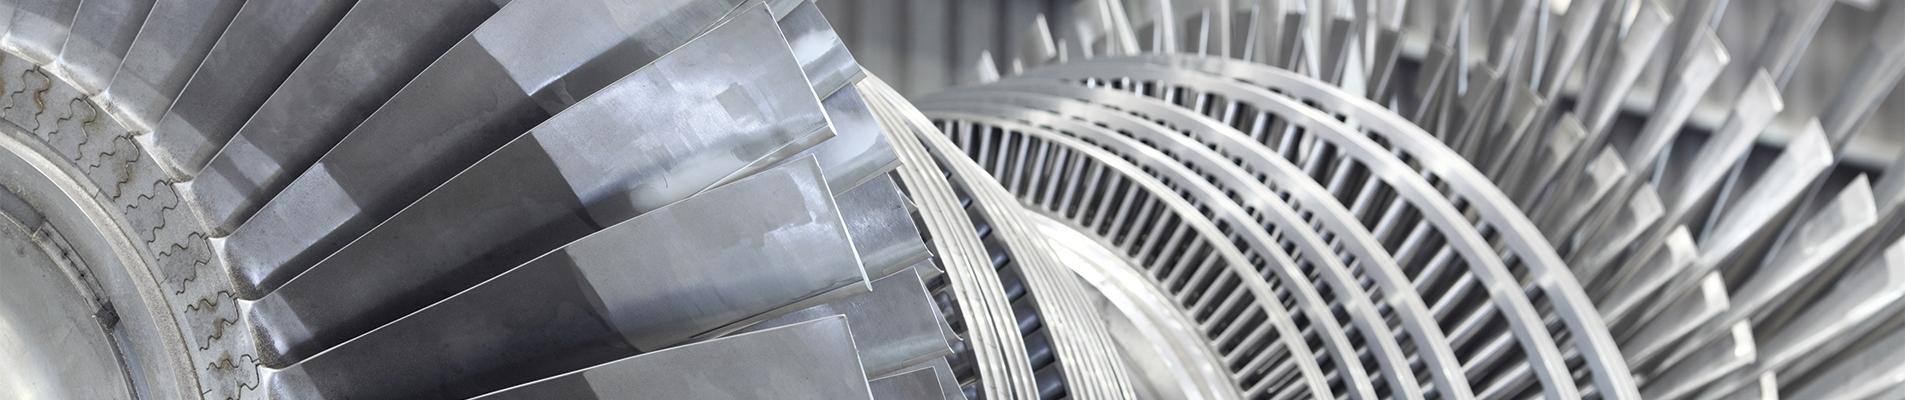 banner-linkedin-turbine